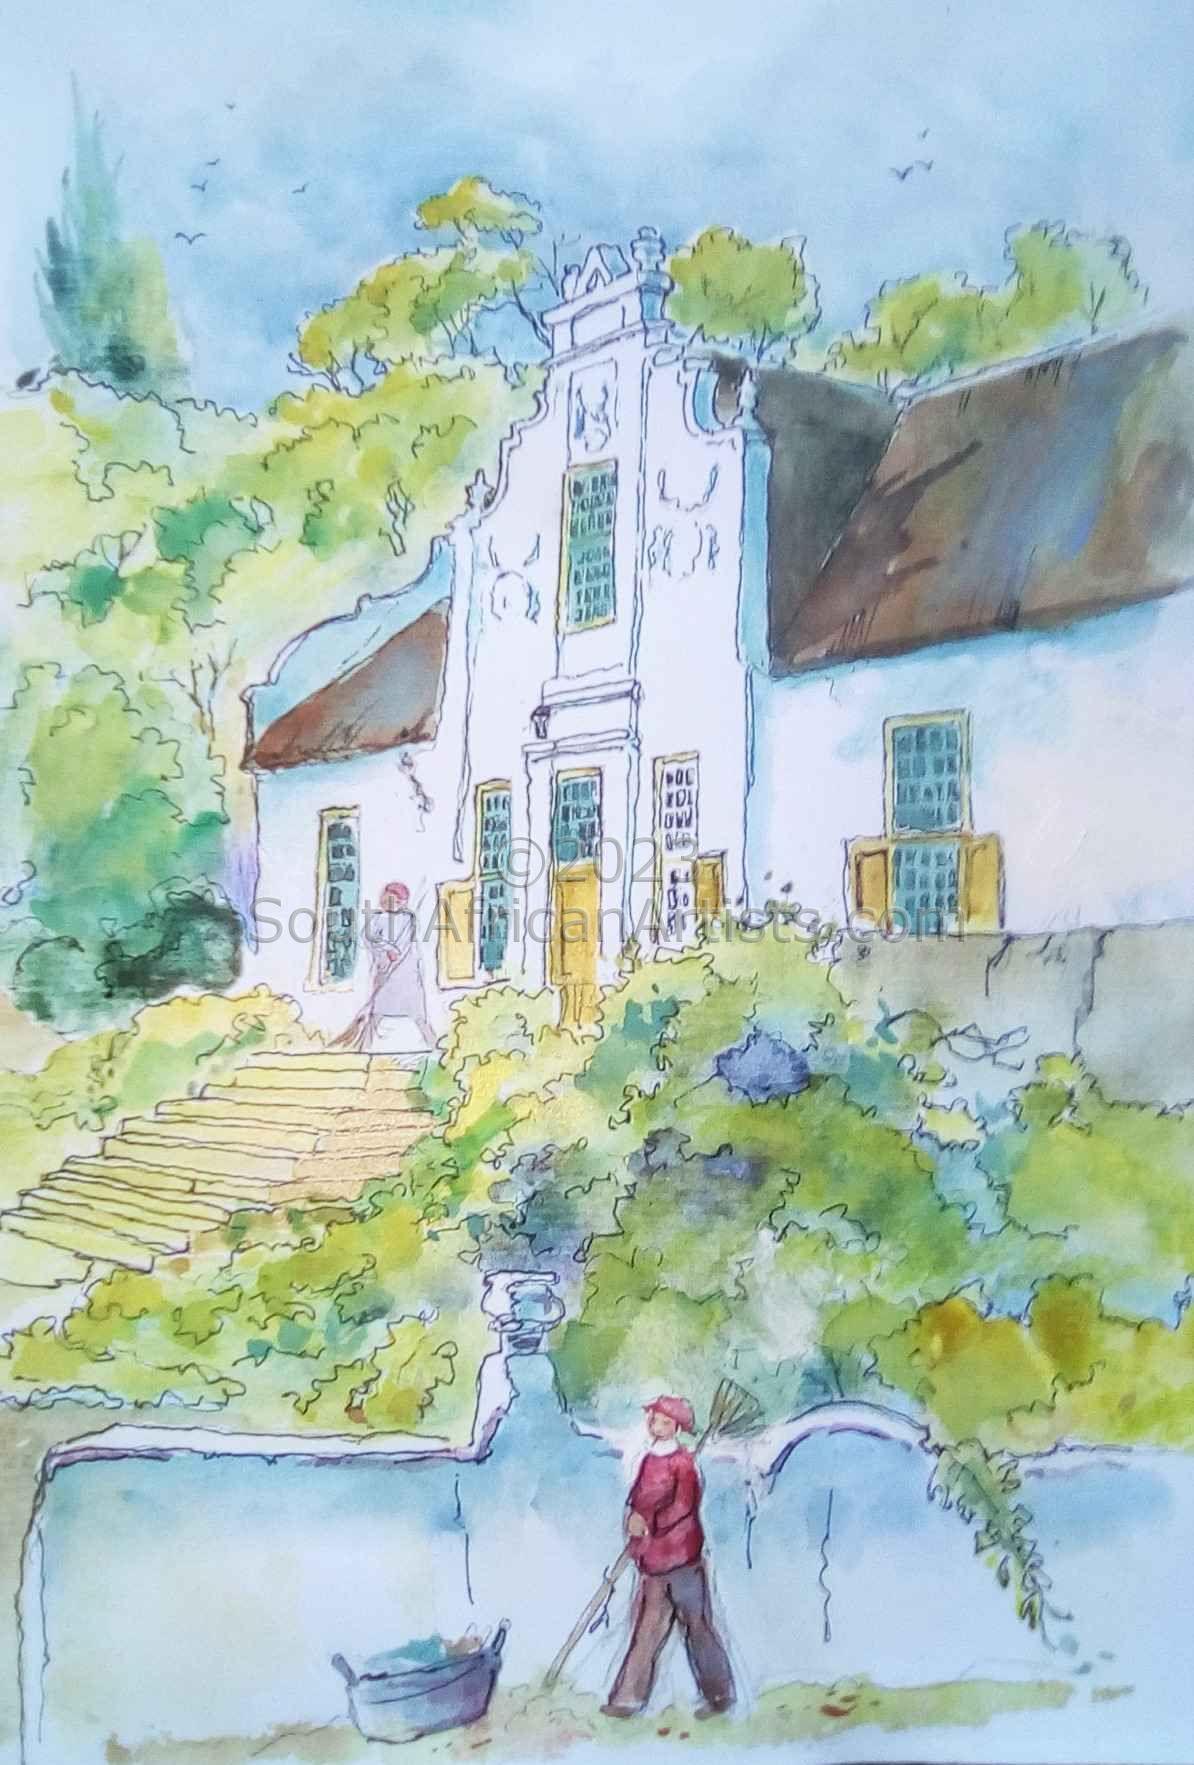 Cape Dutch Homestead